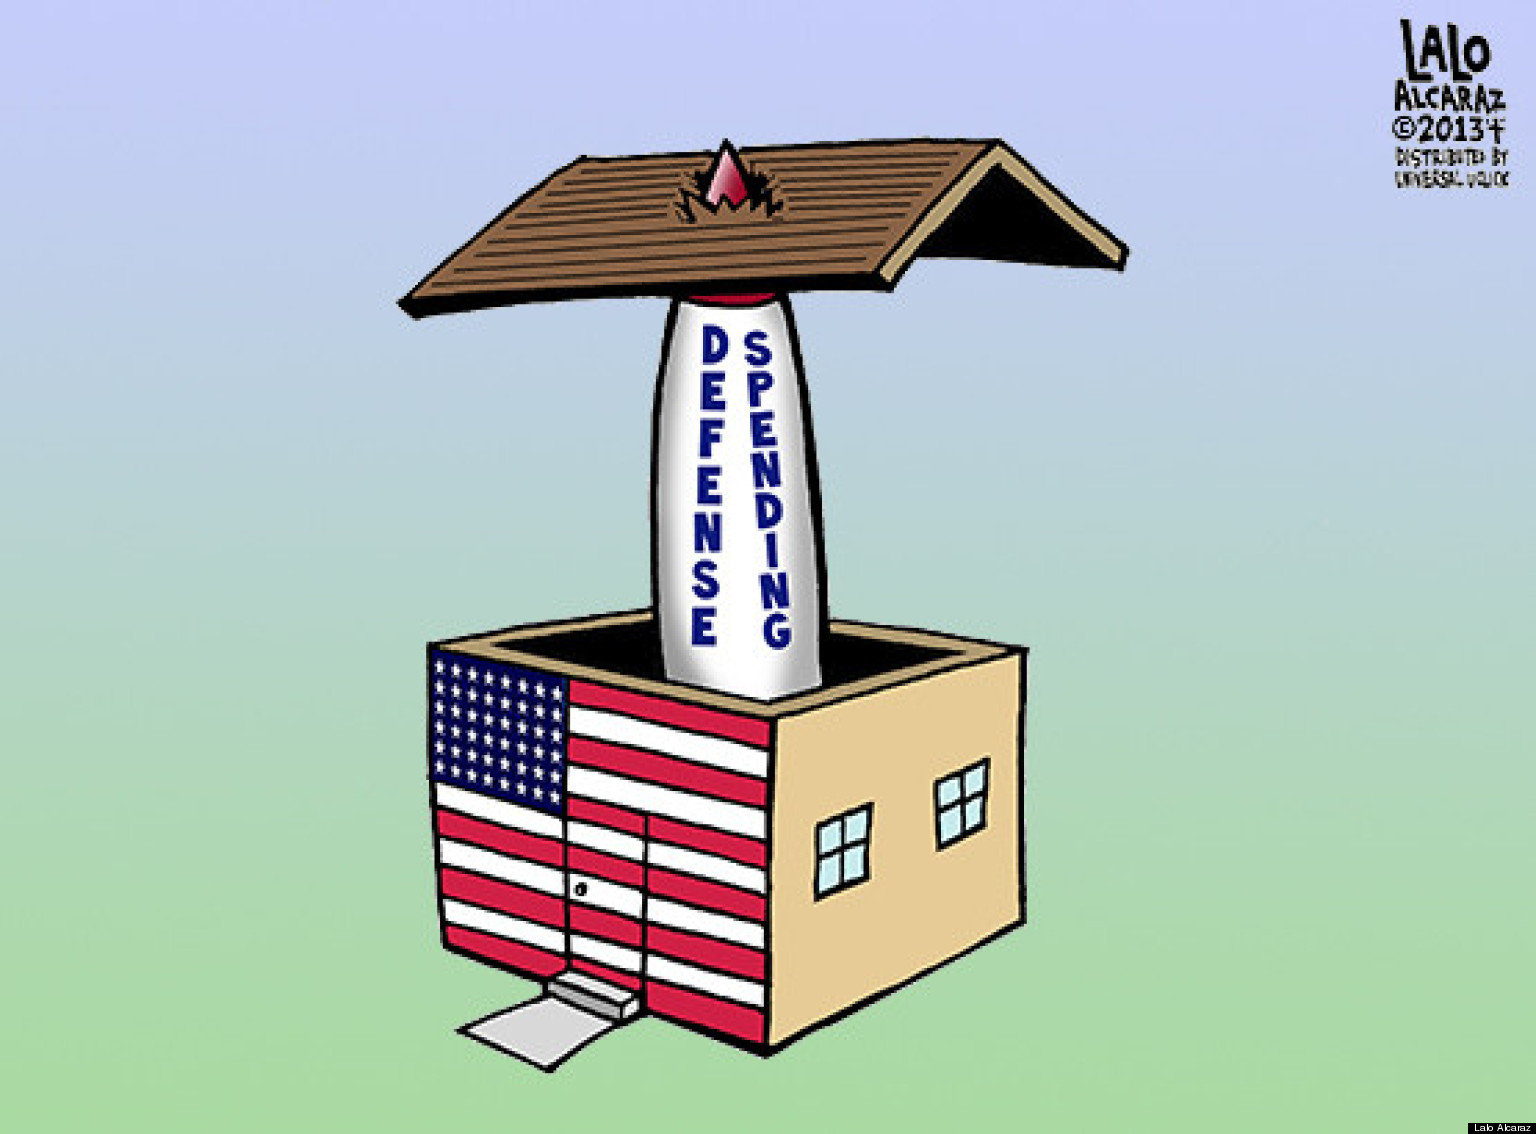 Debt ceiling raise roof